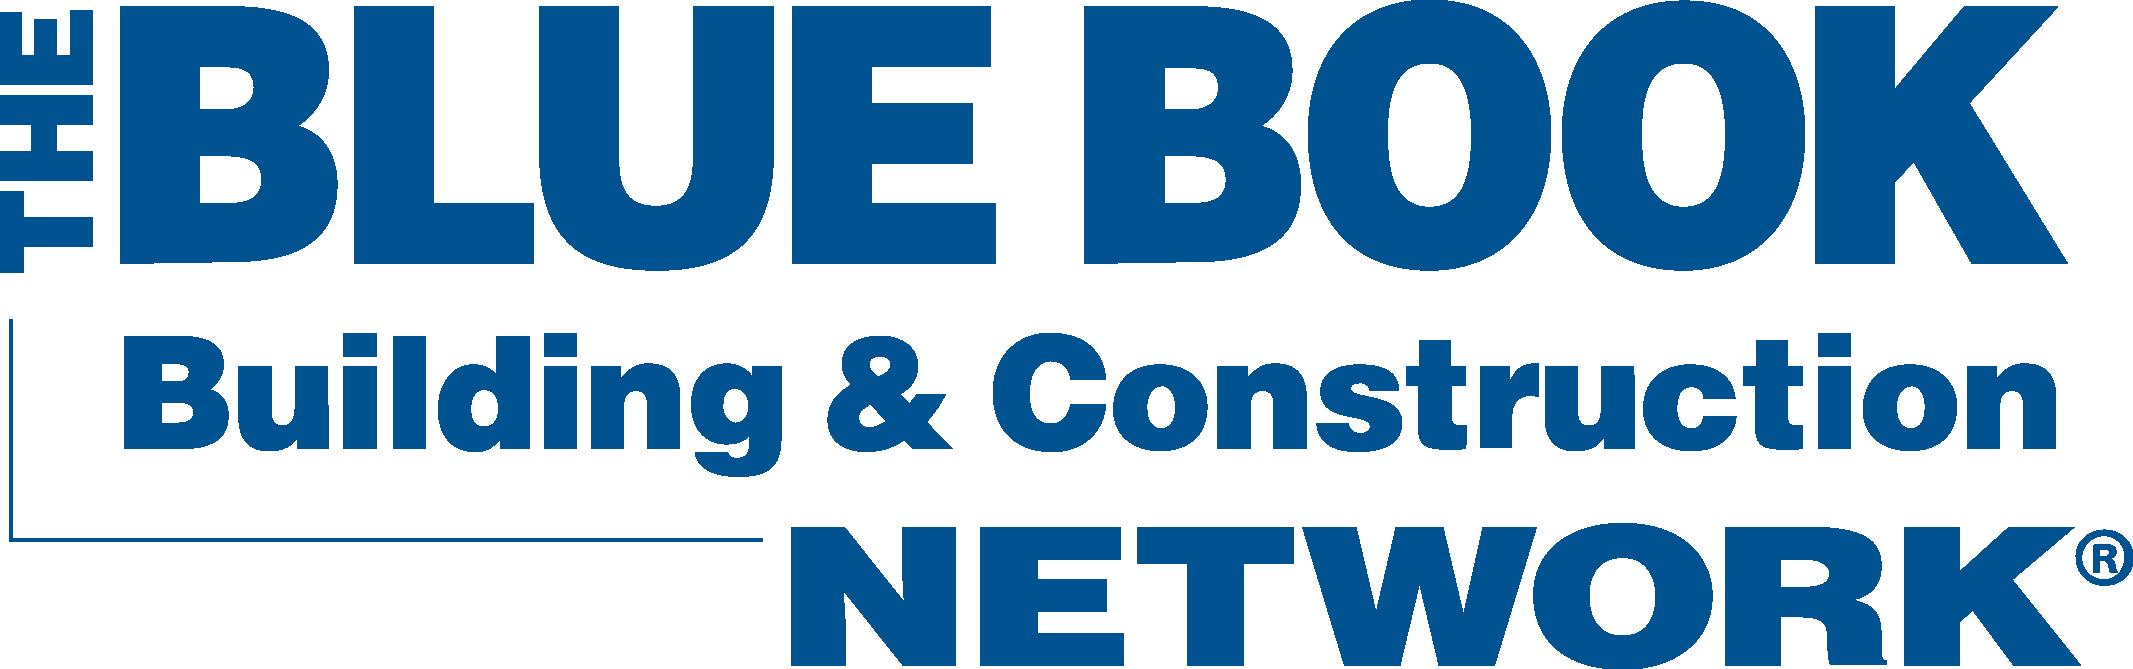 bluebook_logo.png